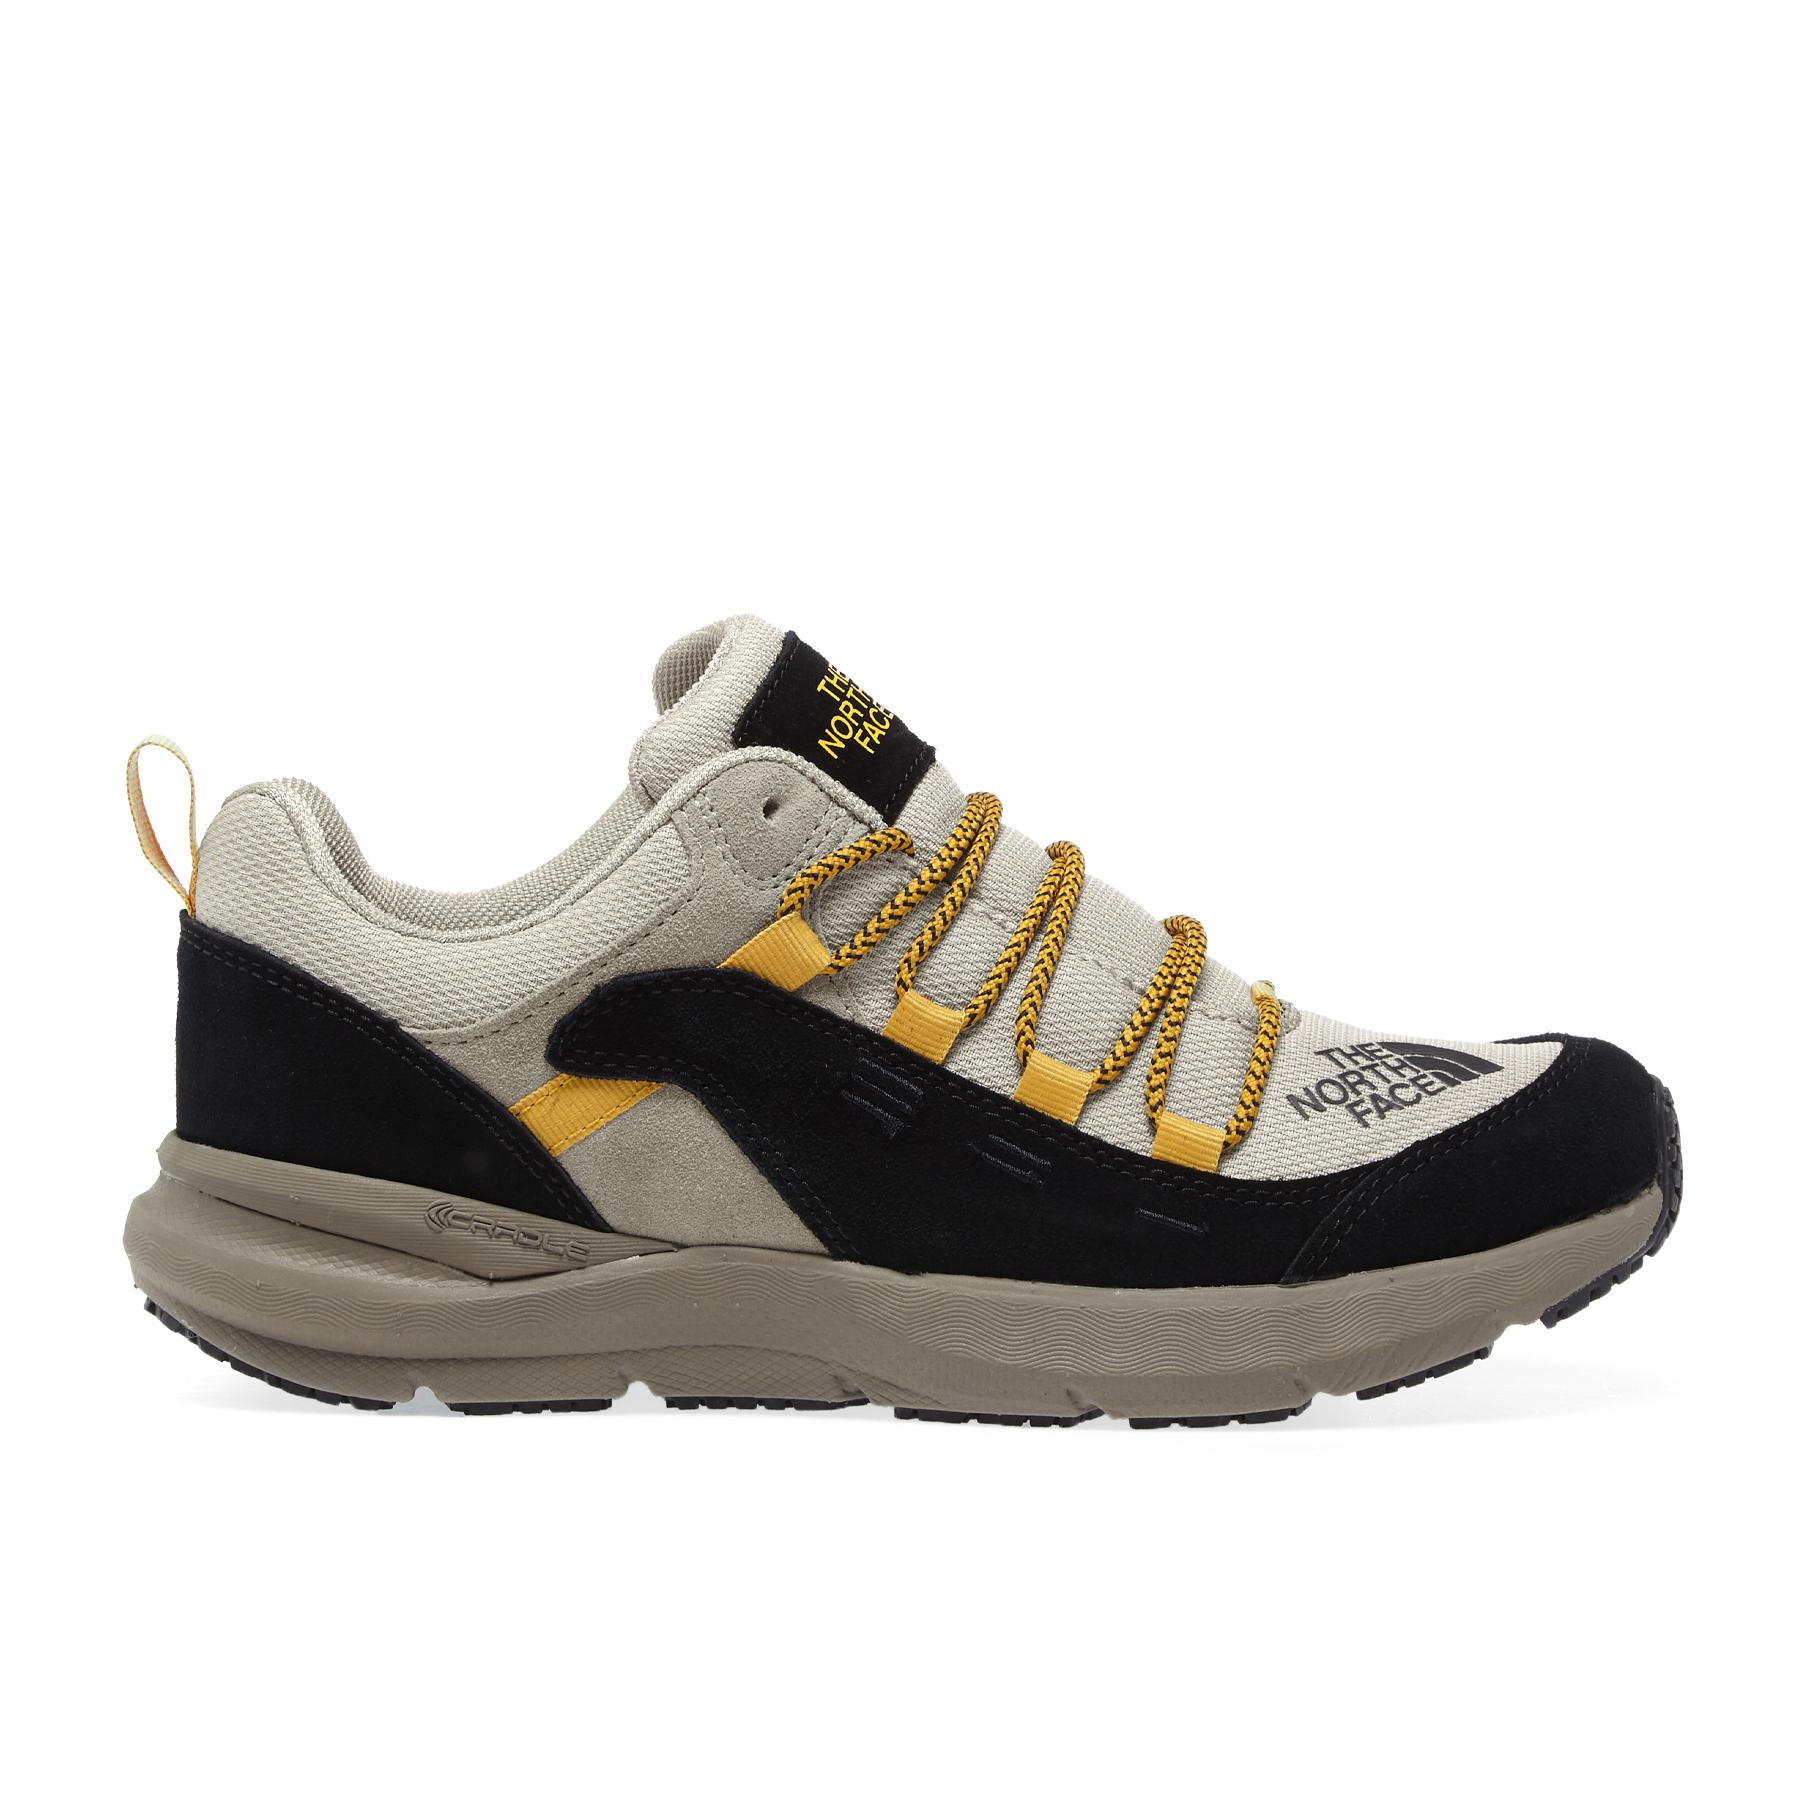 The North Face Mountain Sneaker 2 Mens Footwear Walking Shoes Oxford Tan Tnf